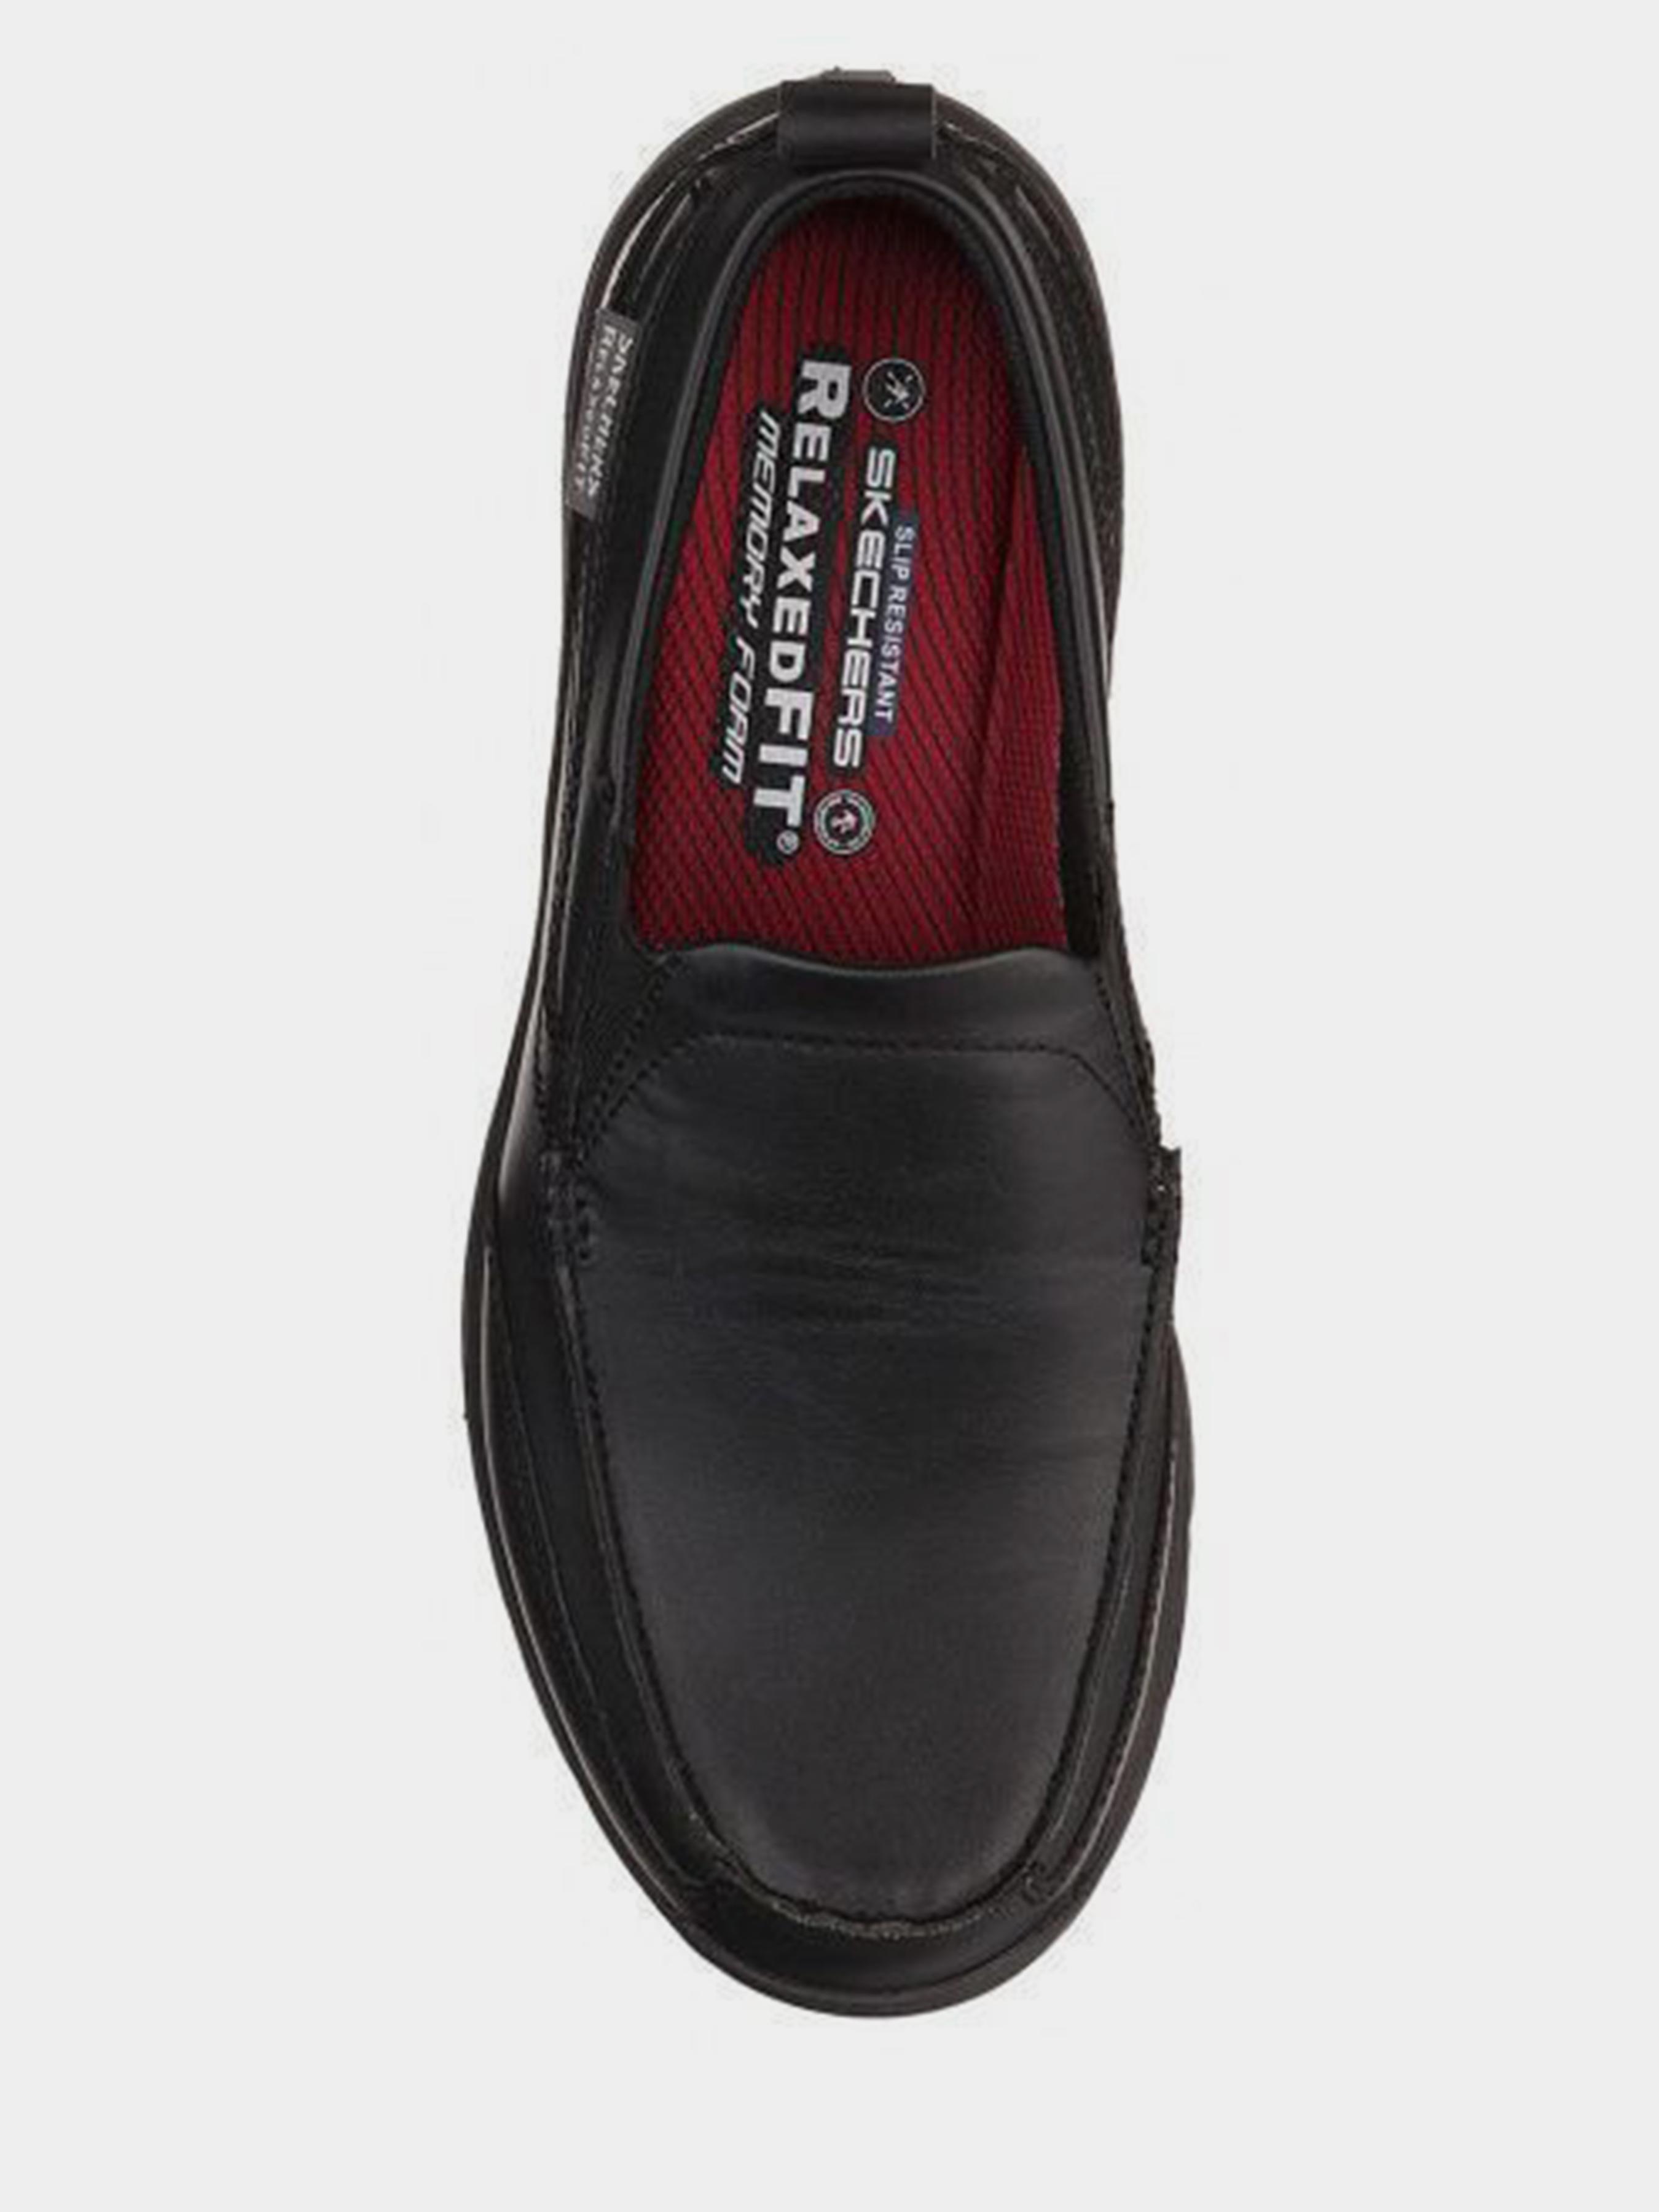 Полуботинки для мужчин Skechers KM3422 размеры обуви, 2017